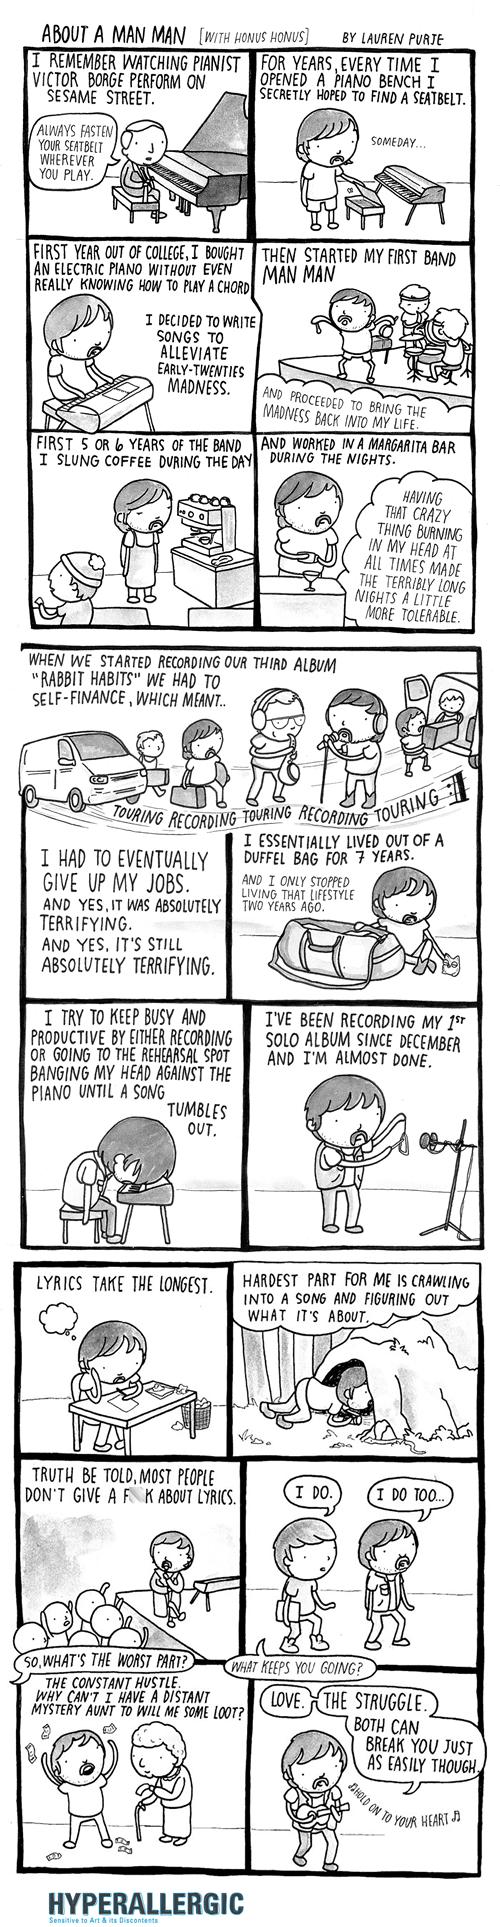 funny-web-comics-a-brief-comic-about-music